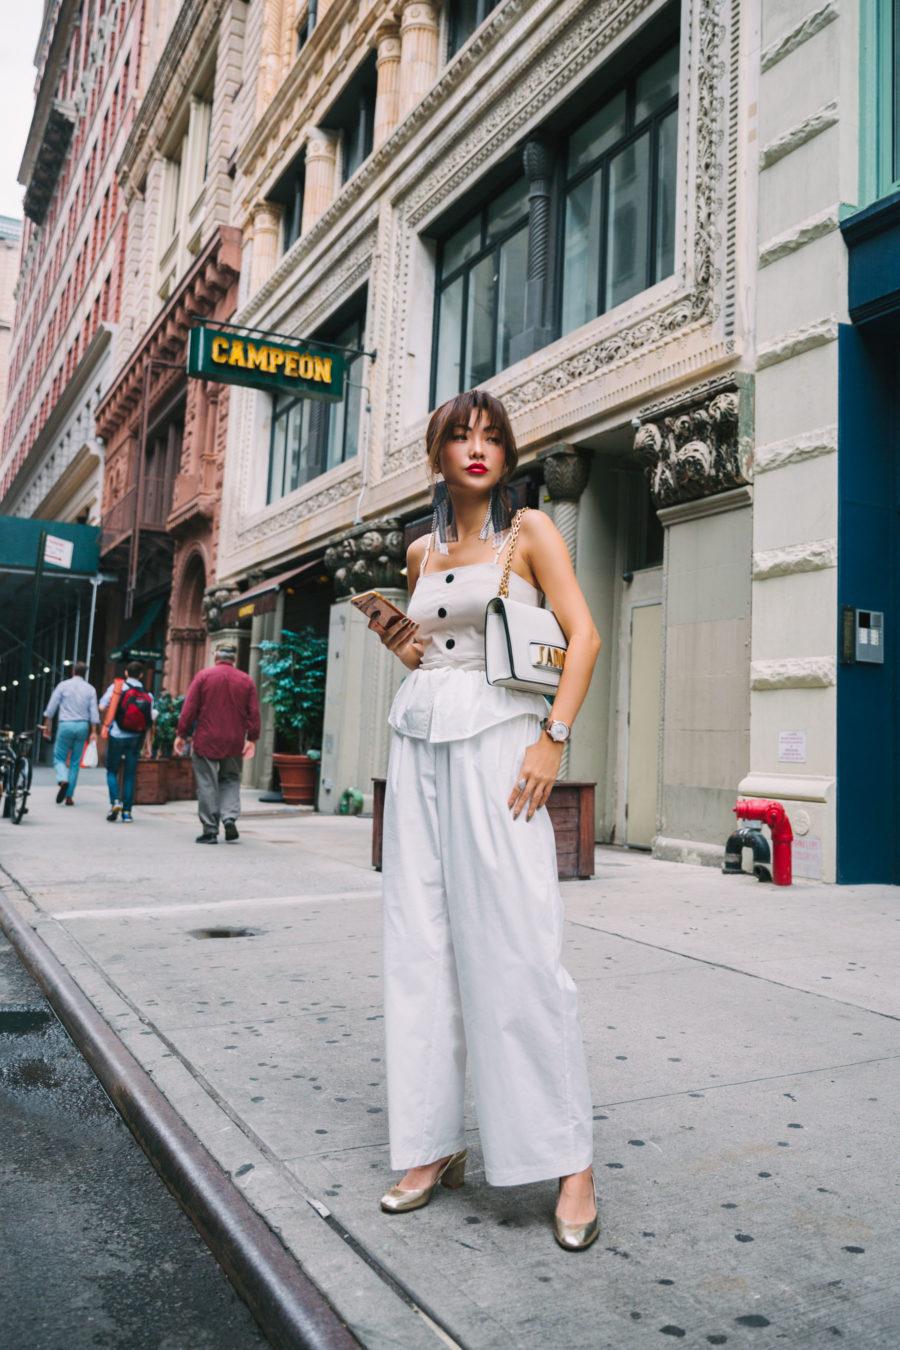 valentino tango pumps // Notjessfashion.com